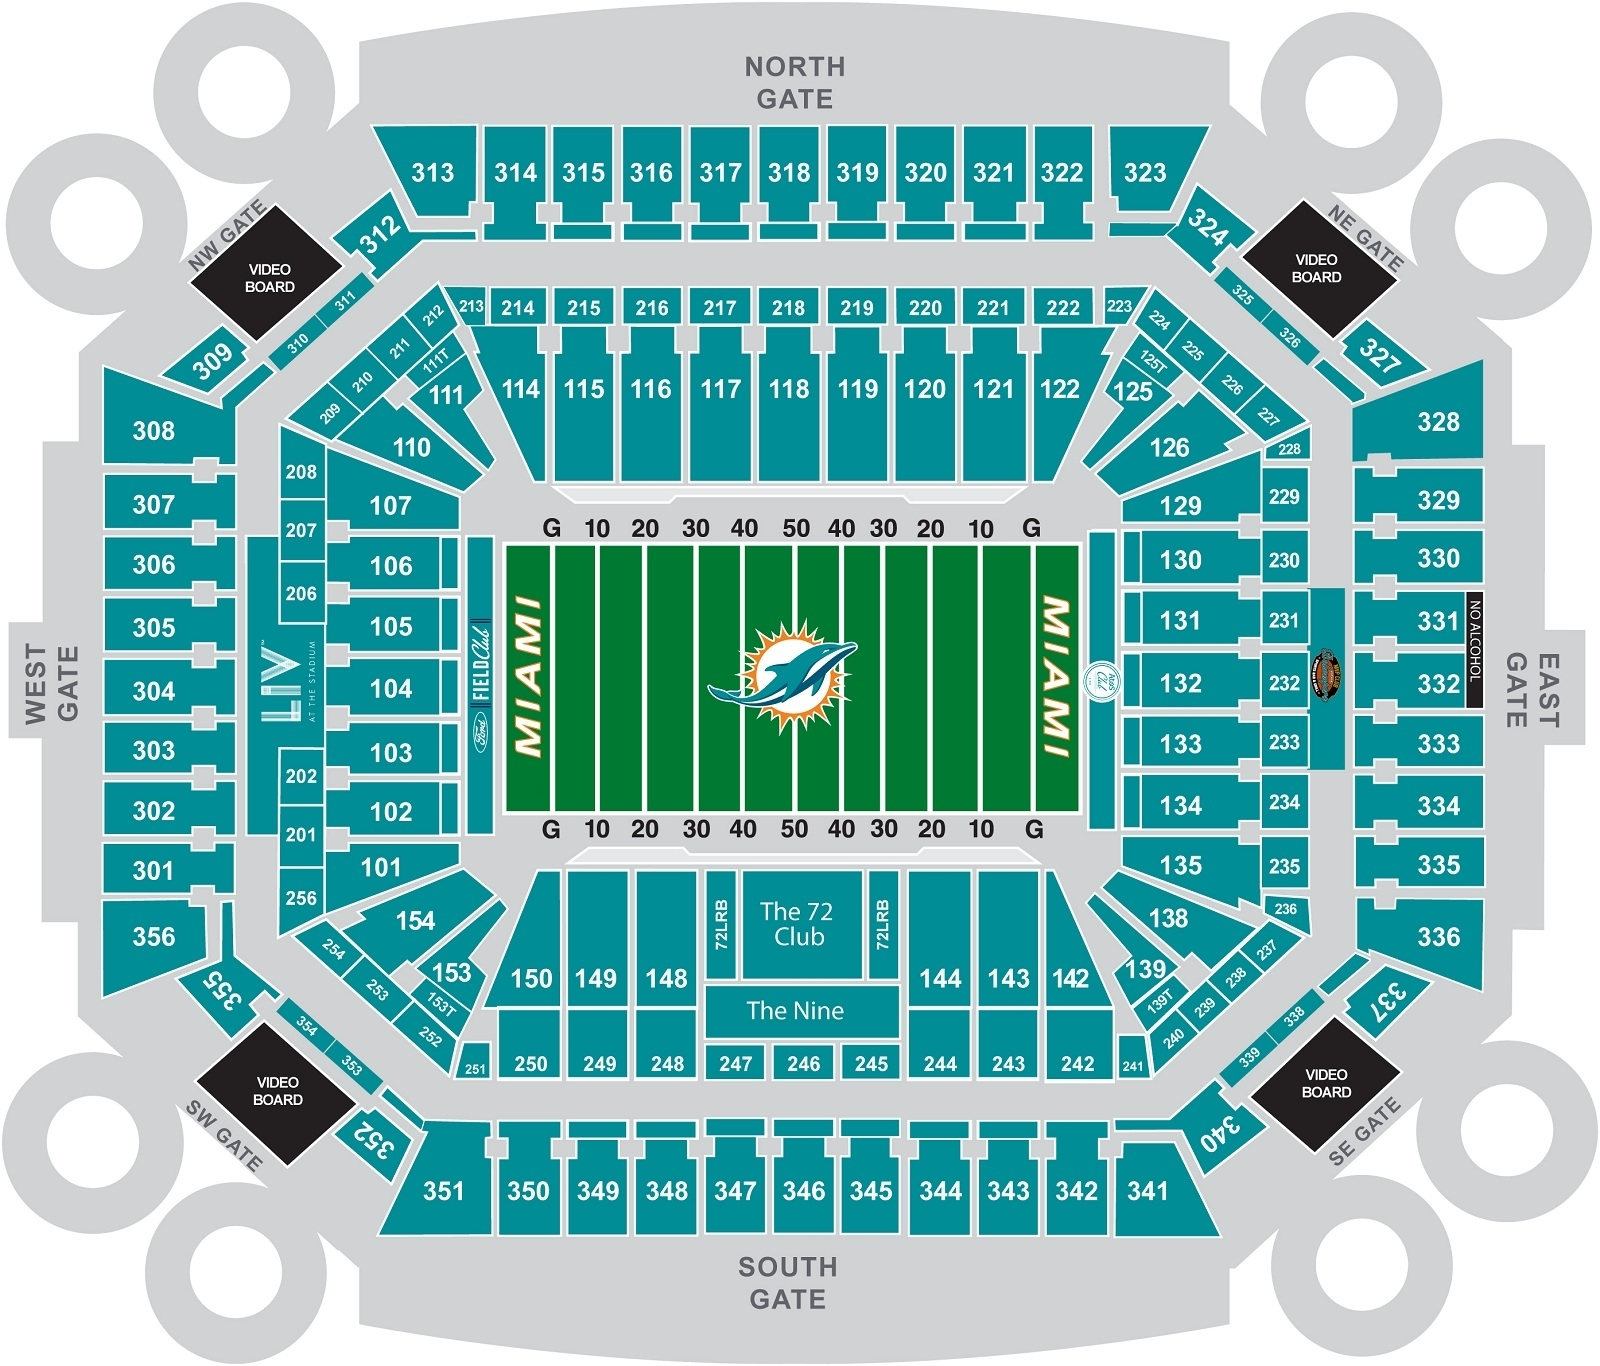 2020 Super Bowl Seating Chart | February 2, 2020 | Fan regarding Atlanta Stadium Super Bowl Seating Capacity